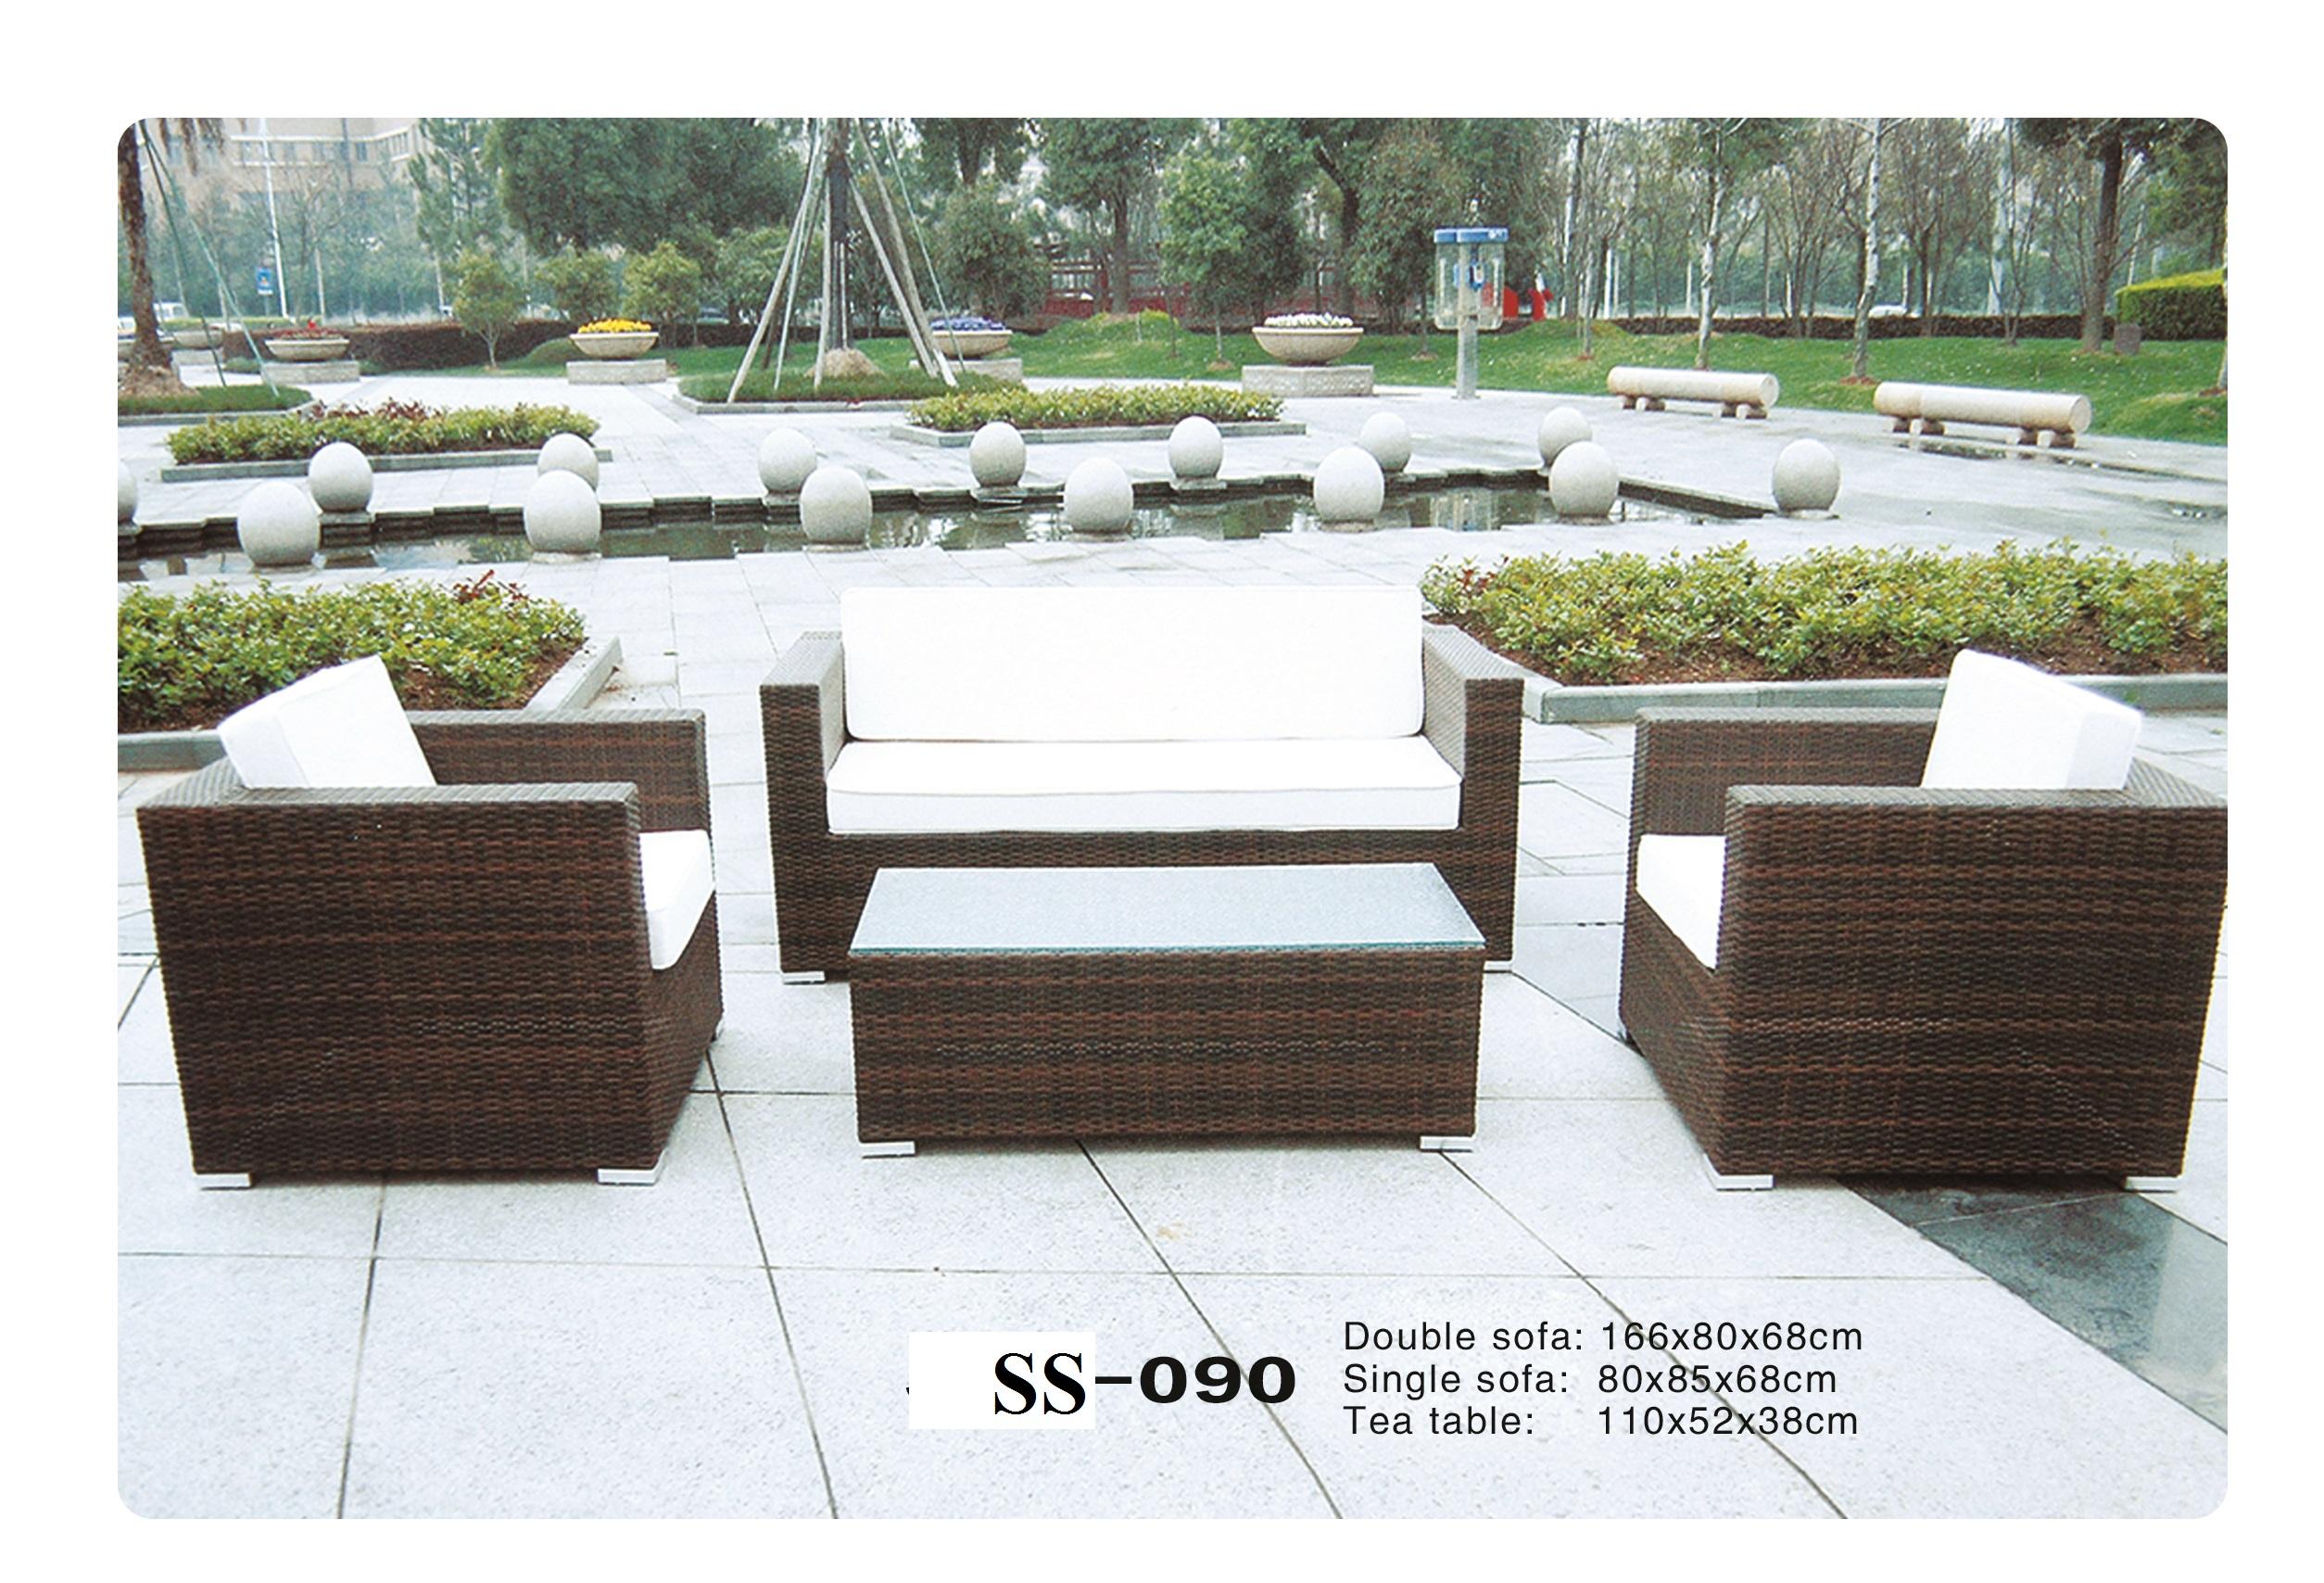 Outdoor wicker sofa Zebano SS-090